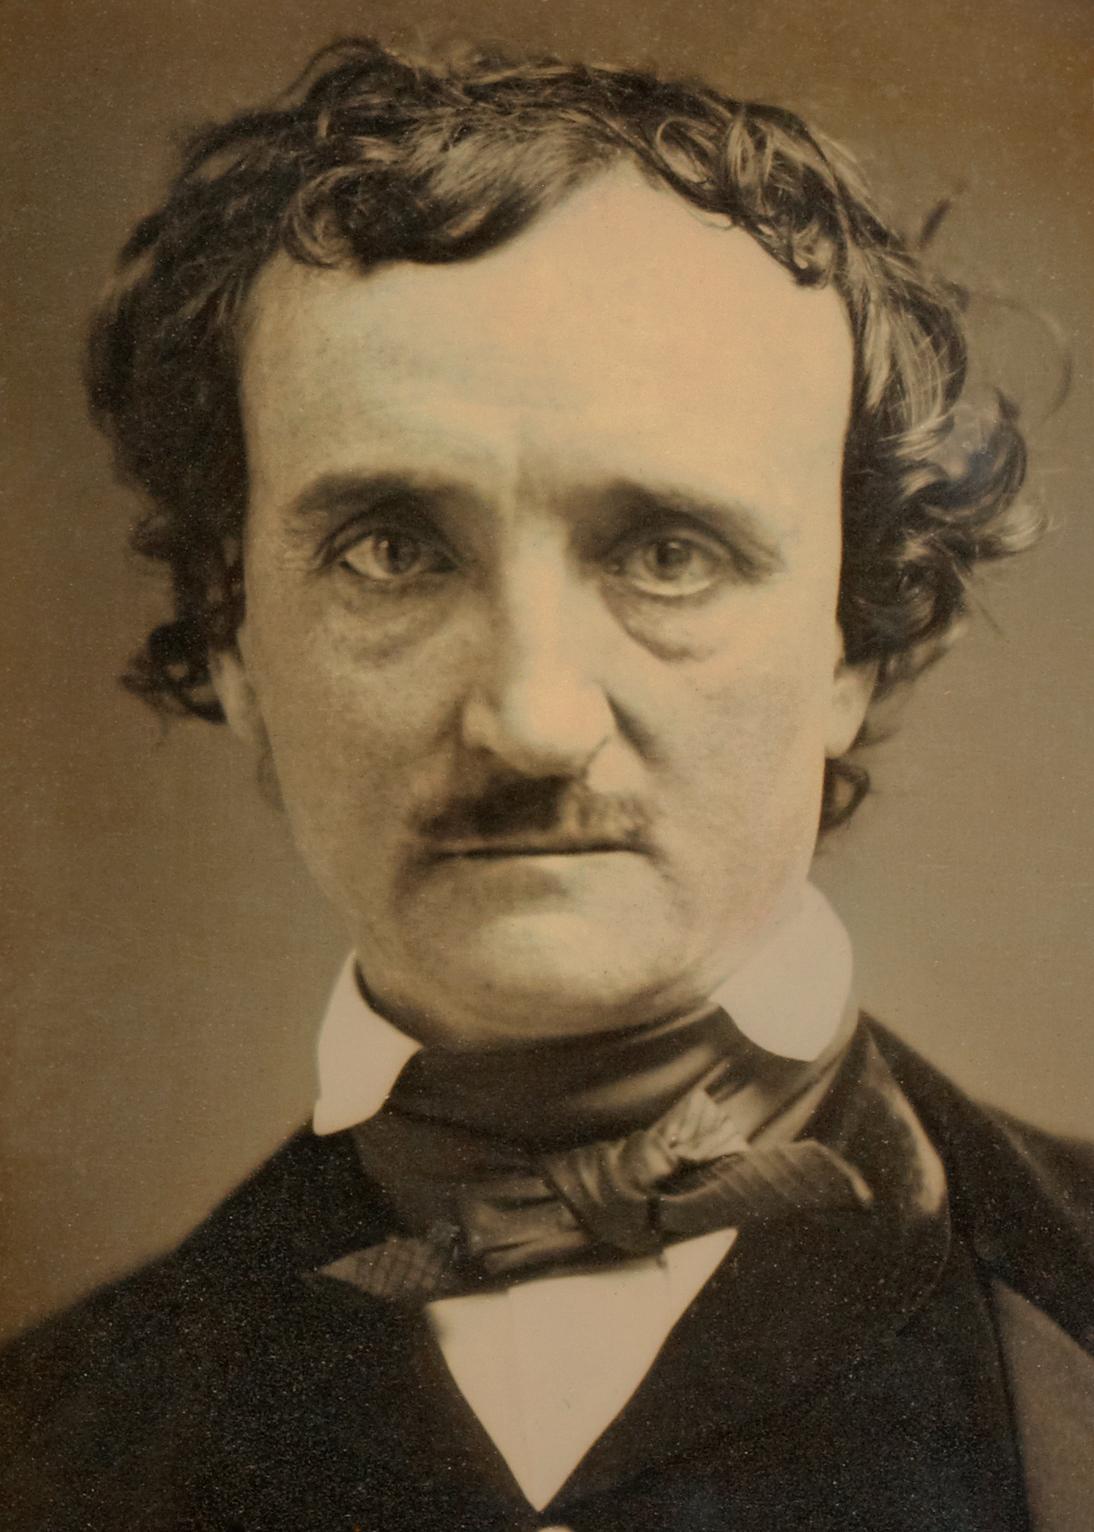 Daguerreotype of Edgar Allan Poe, known as the